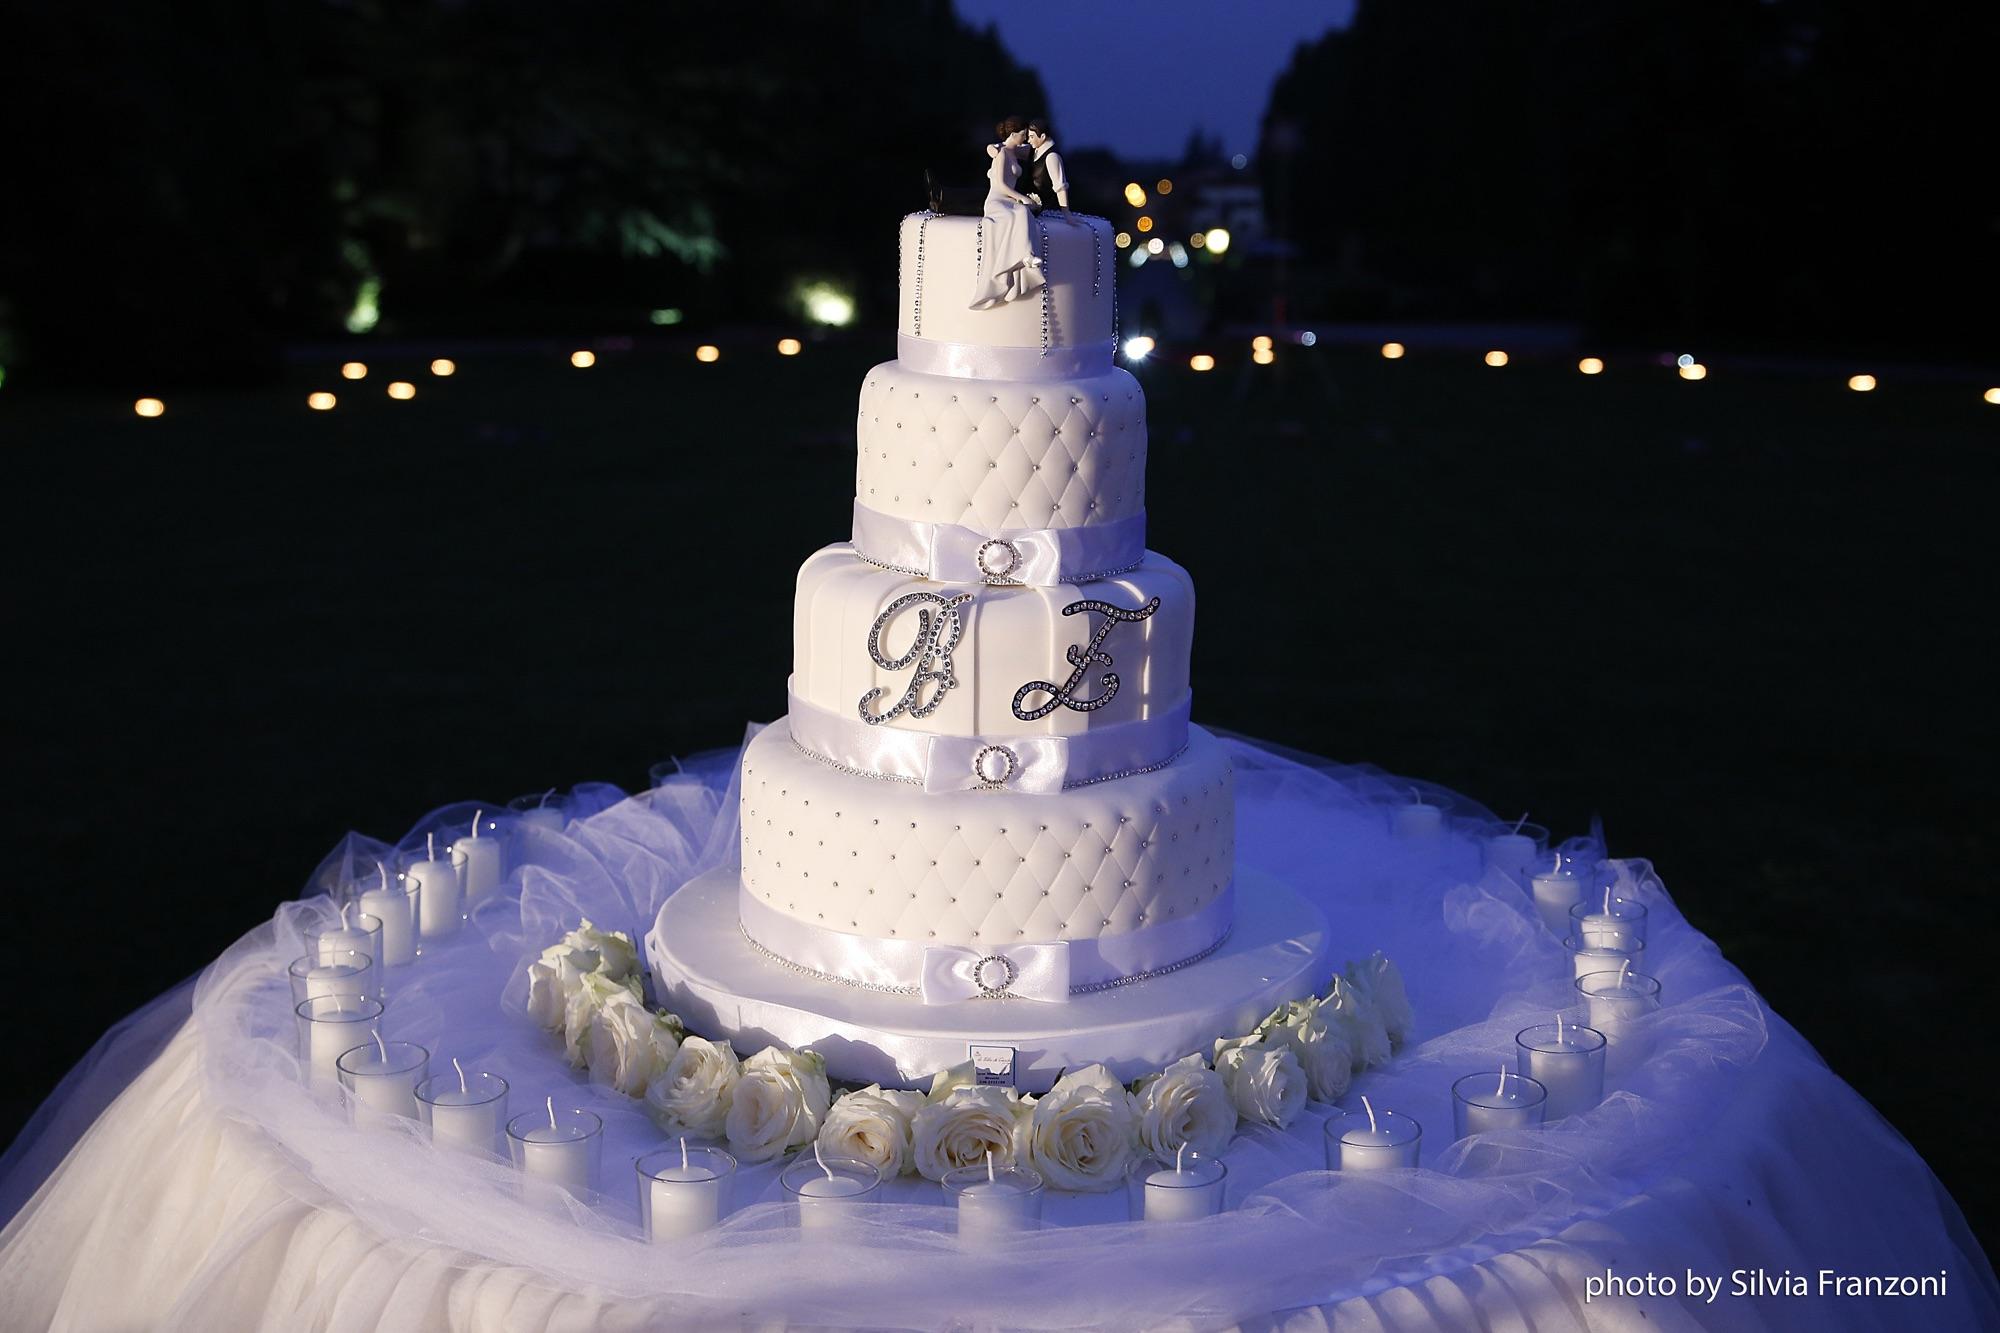 Tema Matrimonio Da Favola : Matrimonio a tema favole le originalissime nozze di elisa e stefano